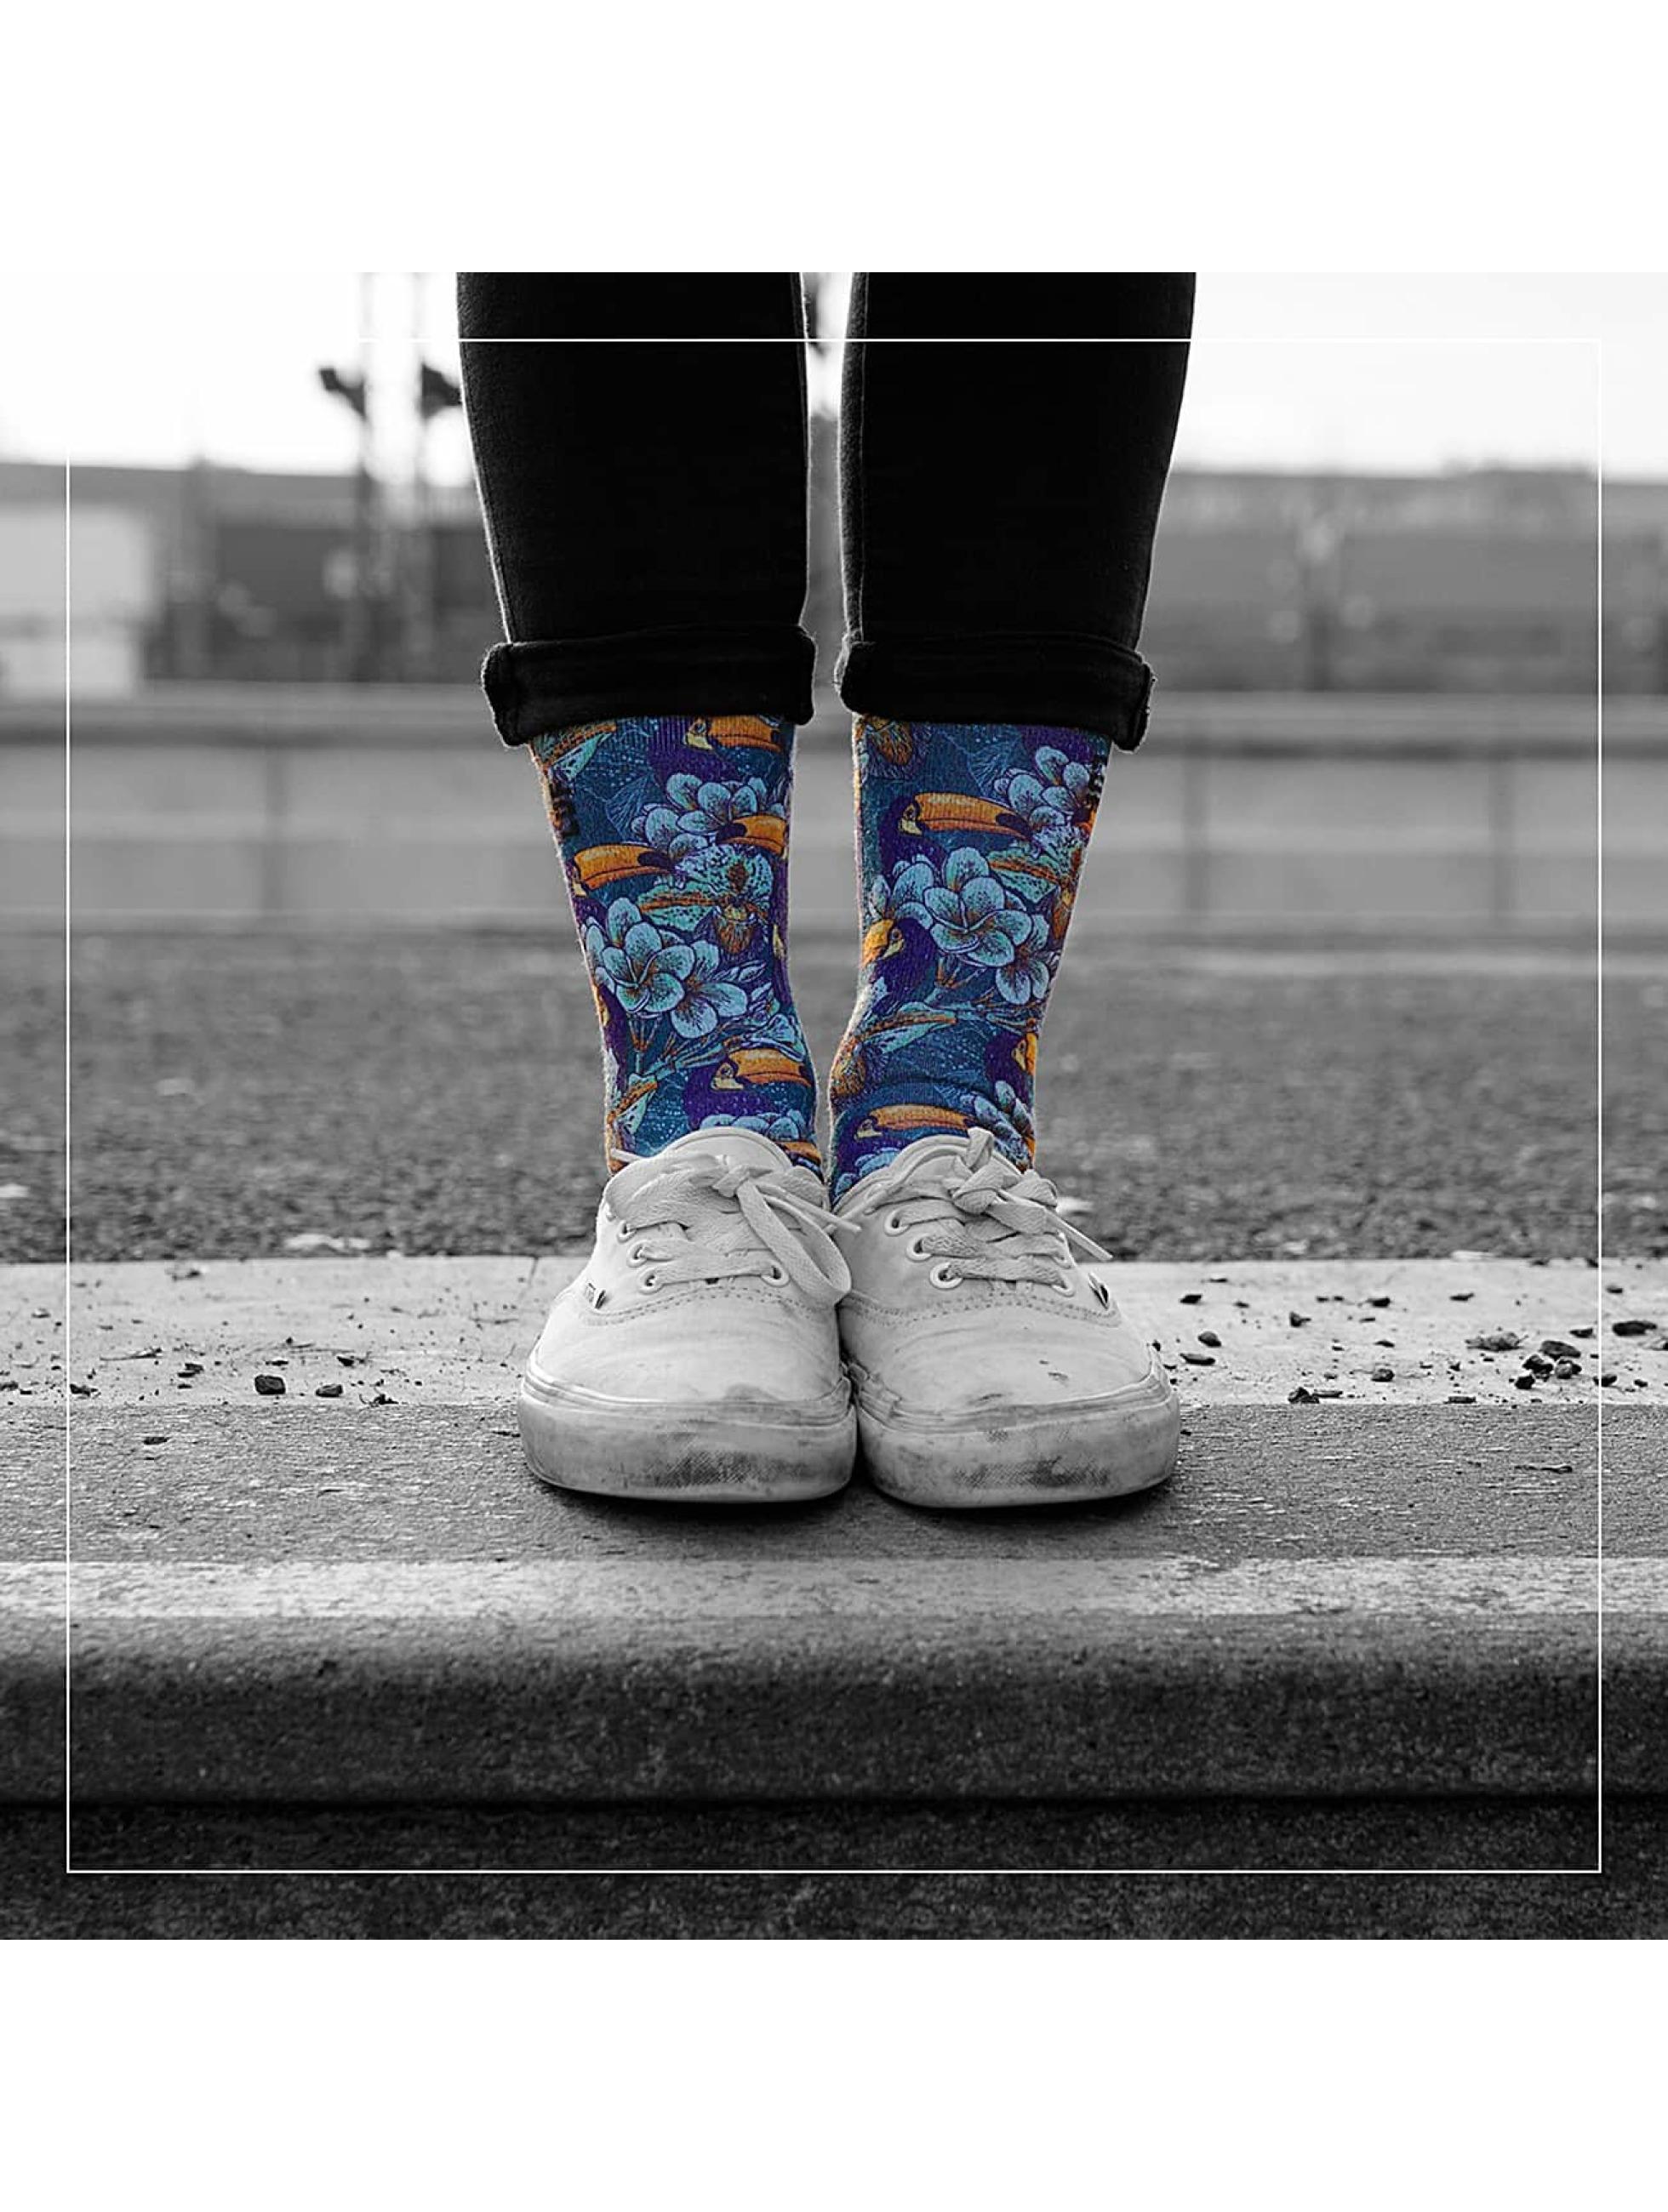 LUF SOX Socks Tika Taka Tuka colored